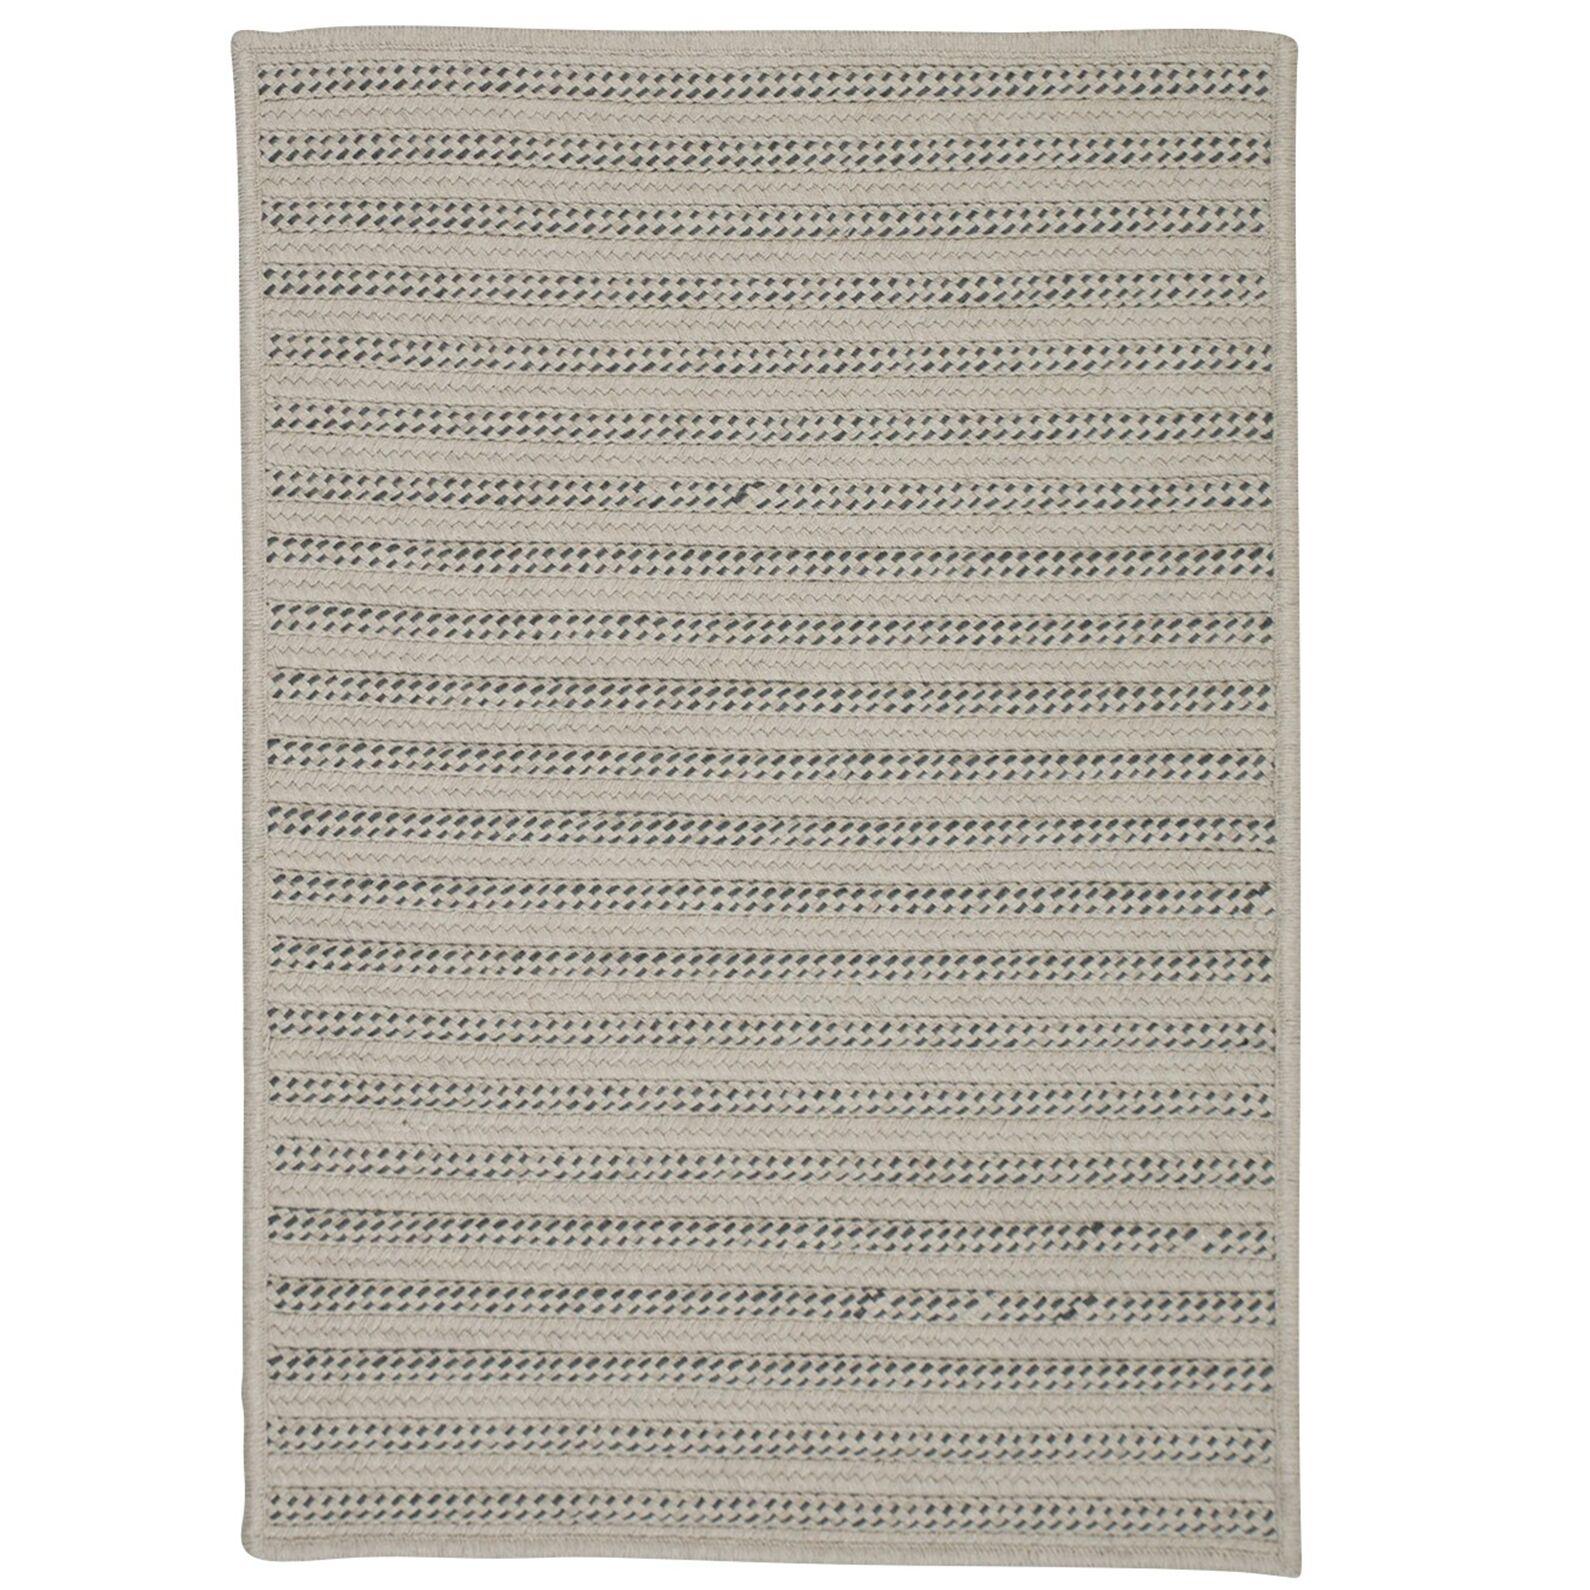 Tidewater Reversible Hand-Woven Natural Indoor/Outdoor Area Rug Rug Size: 9' x 12'